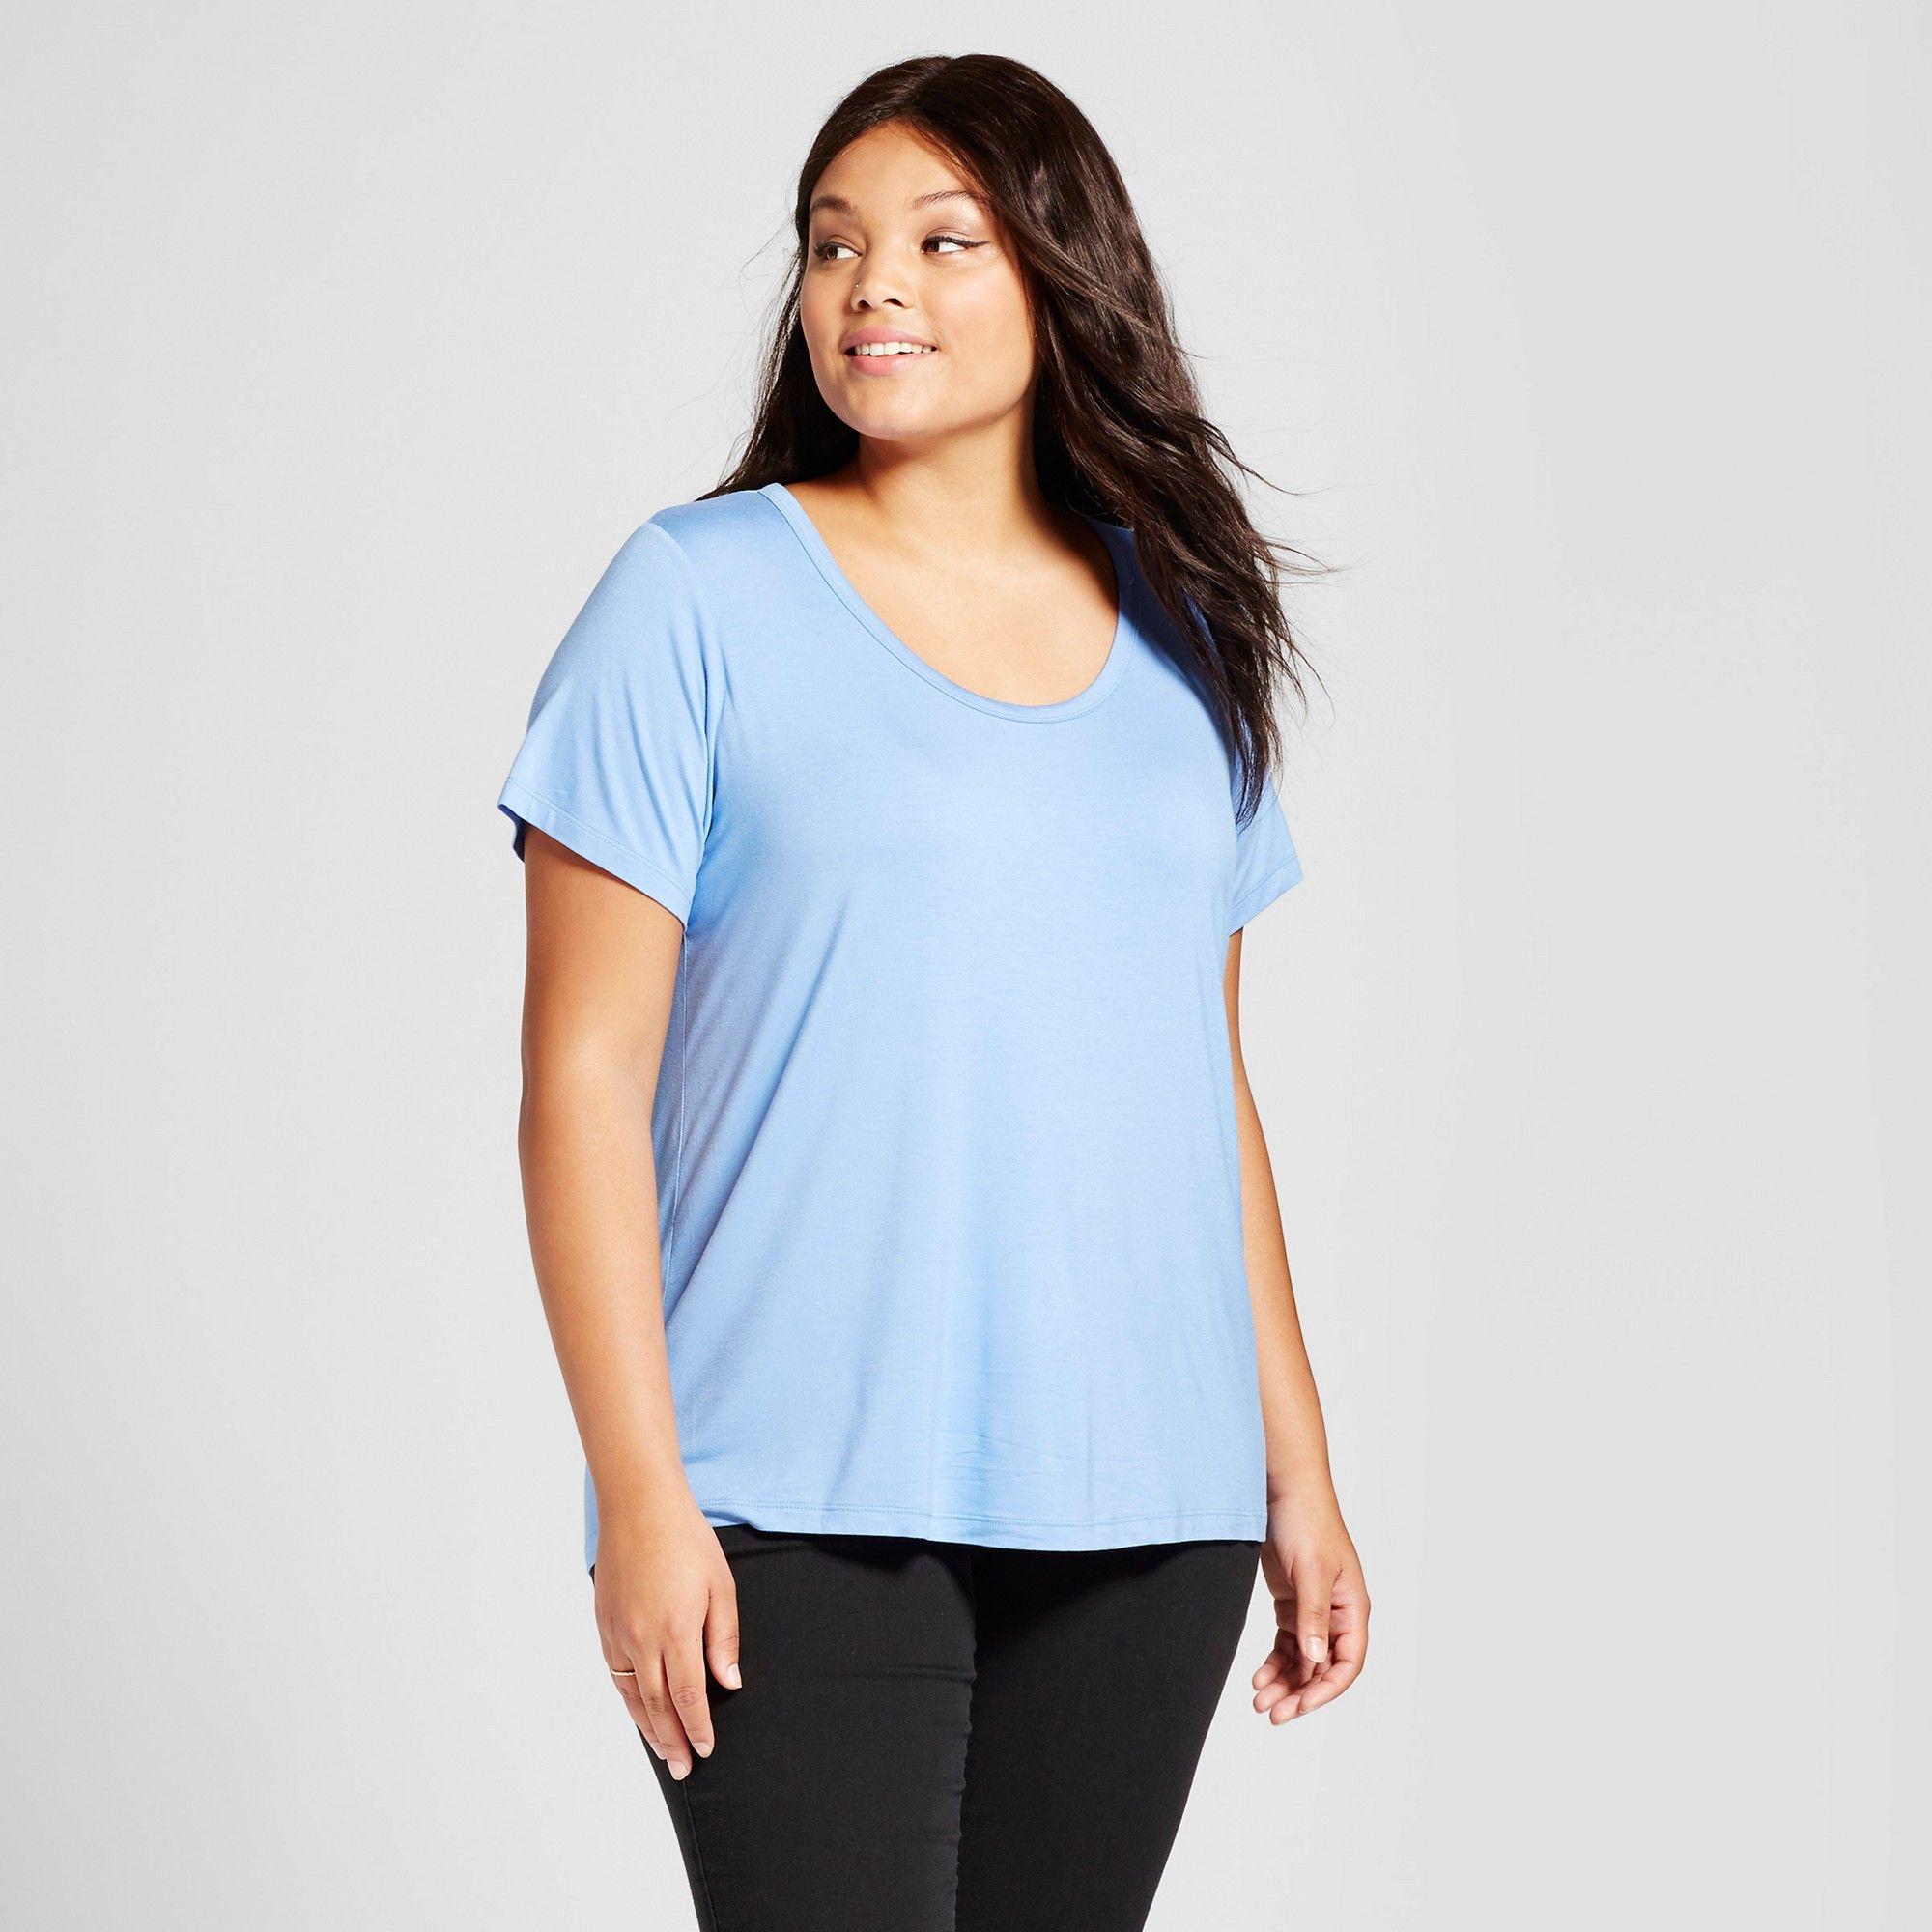 cbcaf0baaa3 Women s Plus Size Short Sleeve Perfect T-Shirt - Ava   Viv Horizon Blue 1X